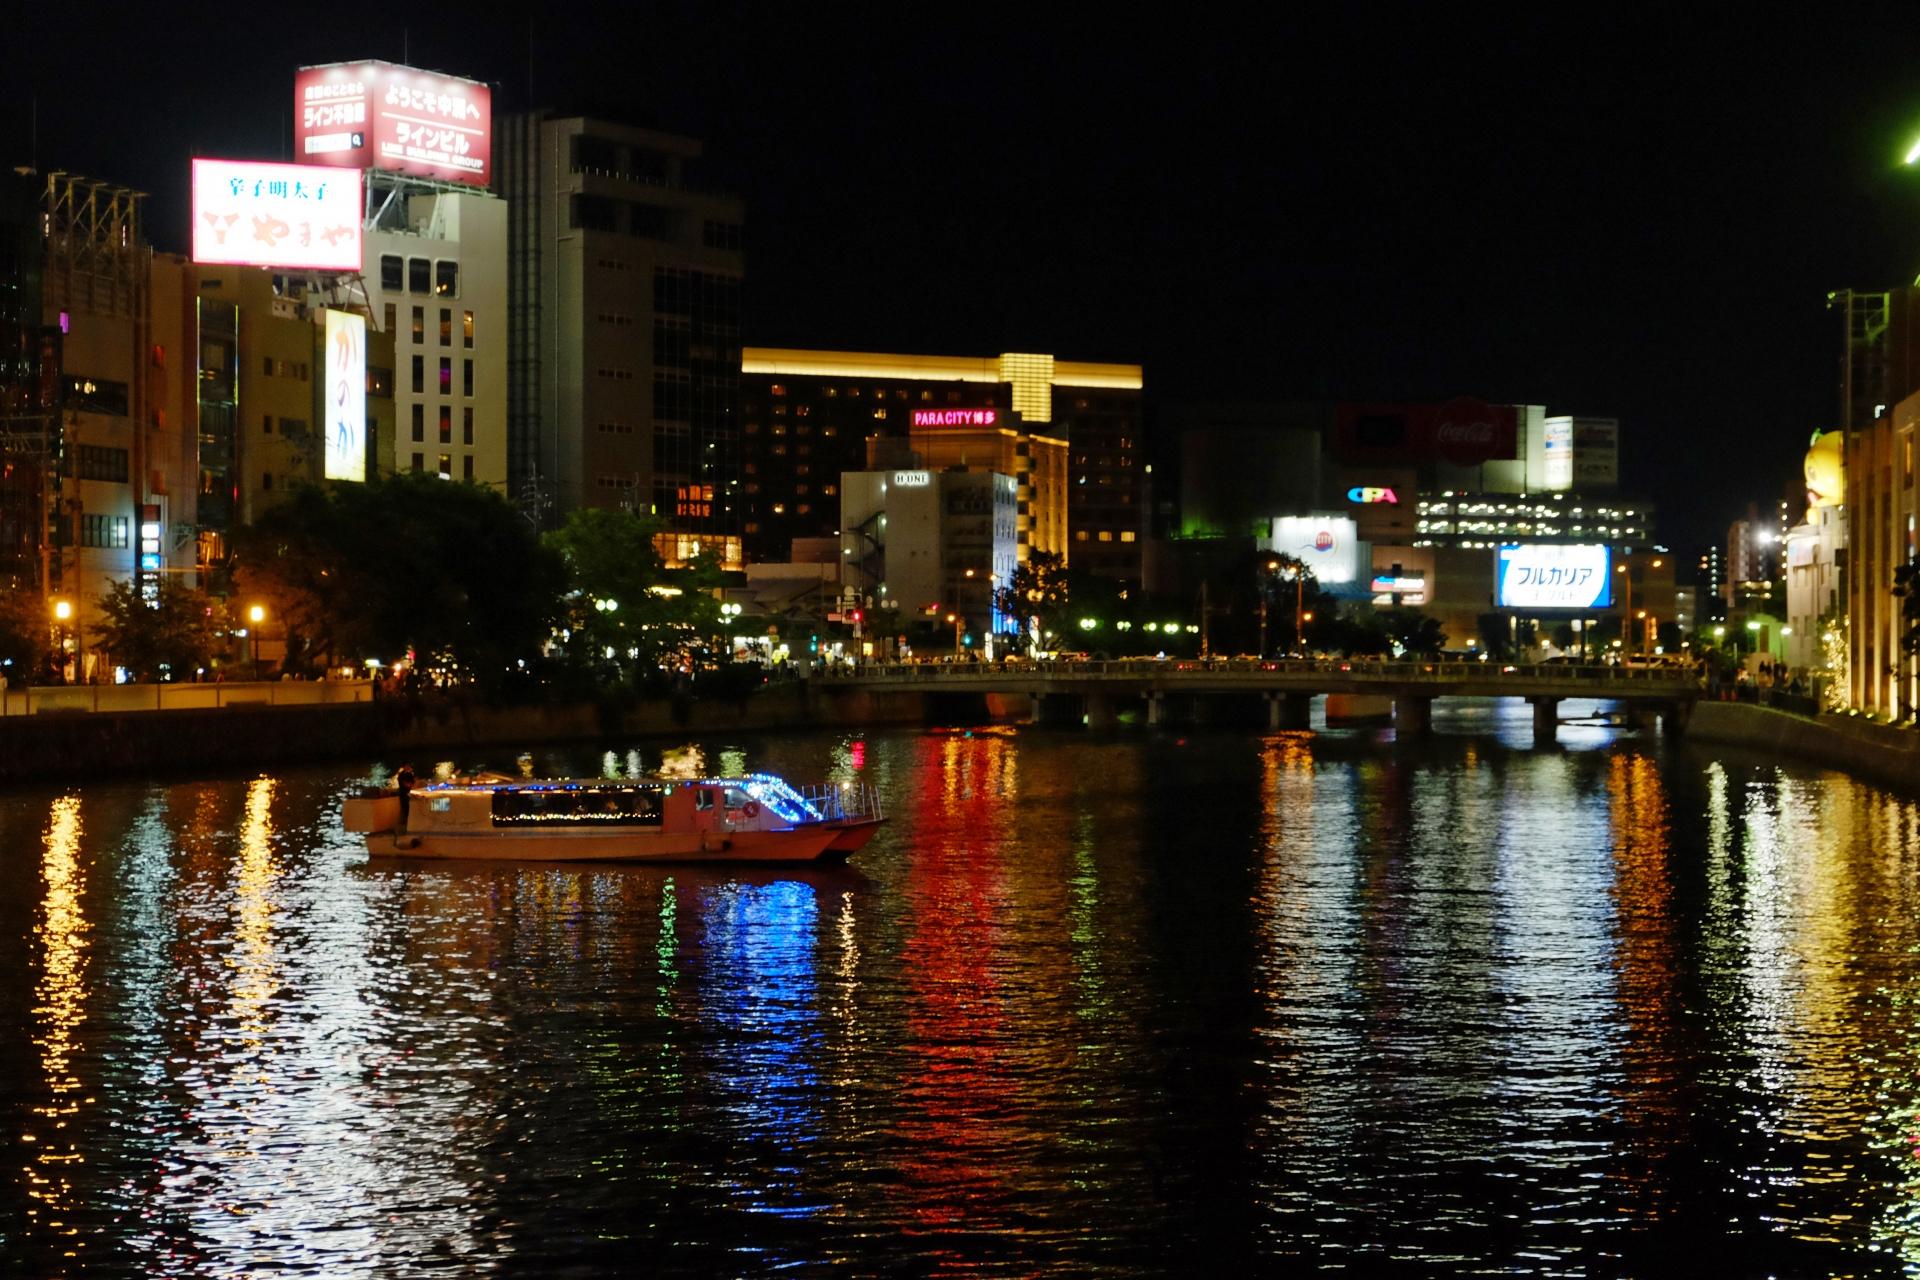 千年夜市 中洲の夜景